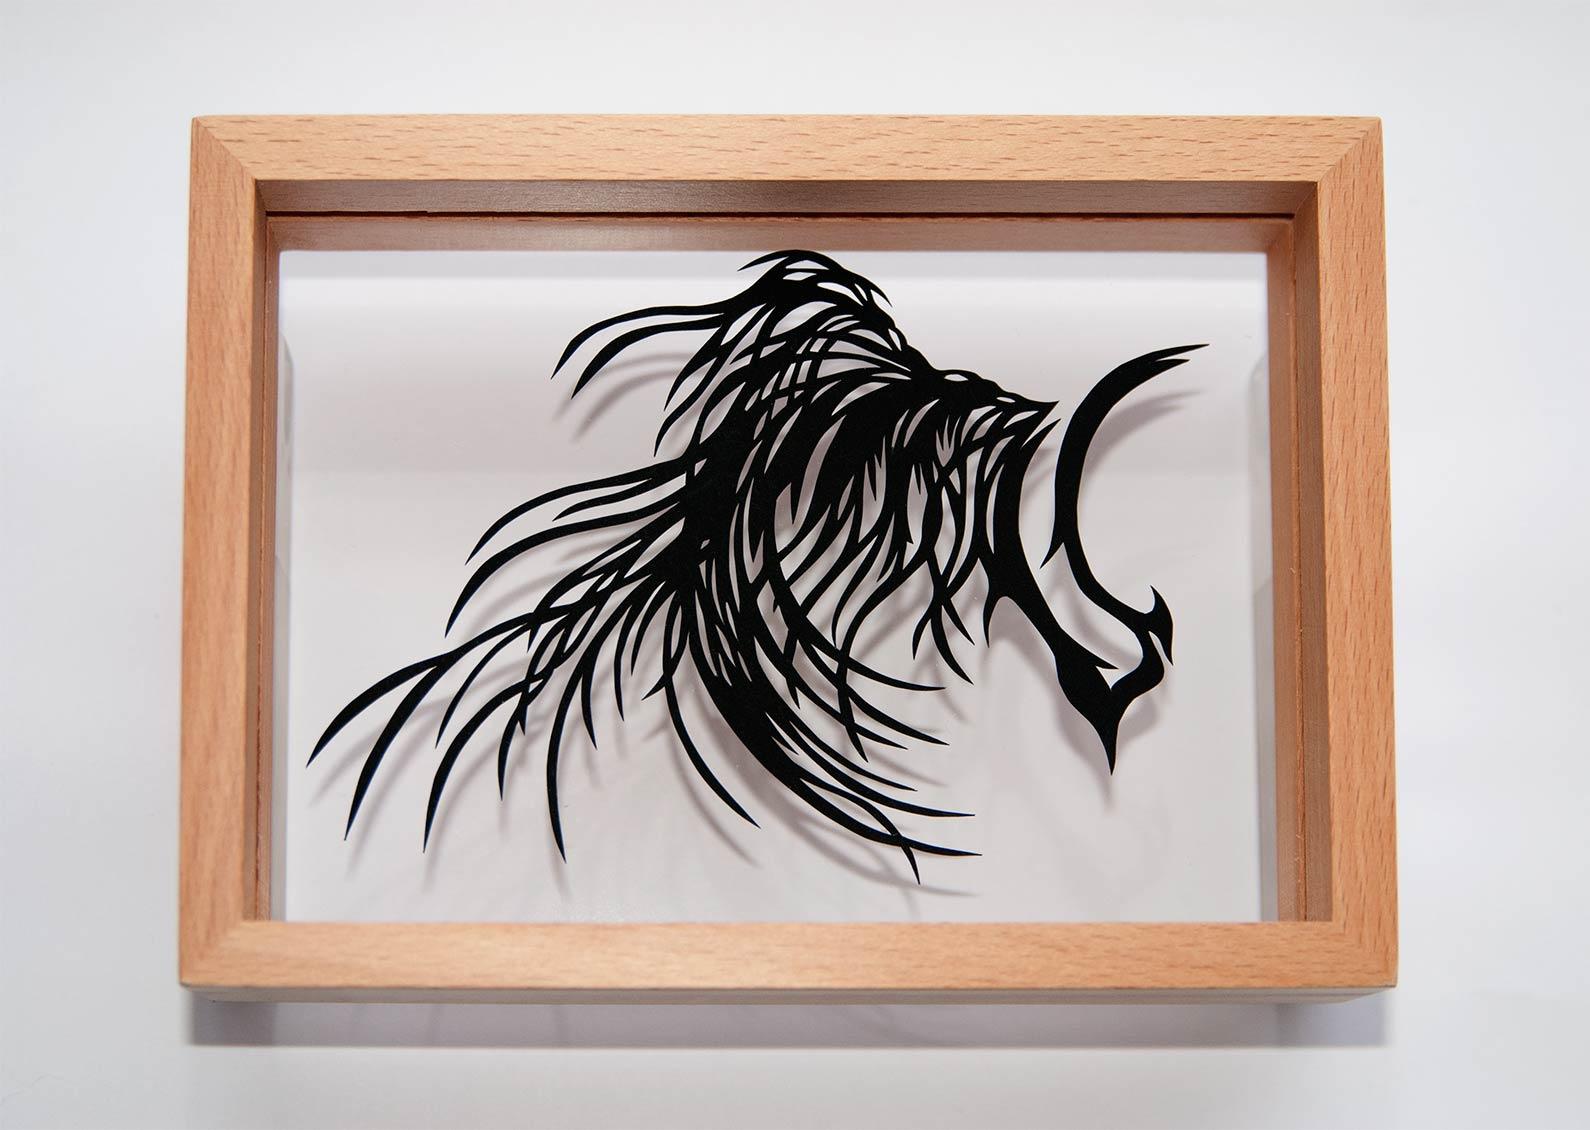 Paper Cut Art New Year 2014 Nahoko Kojima